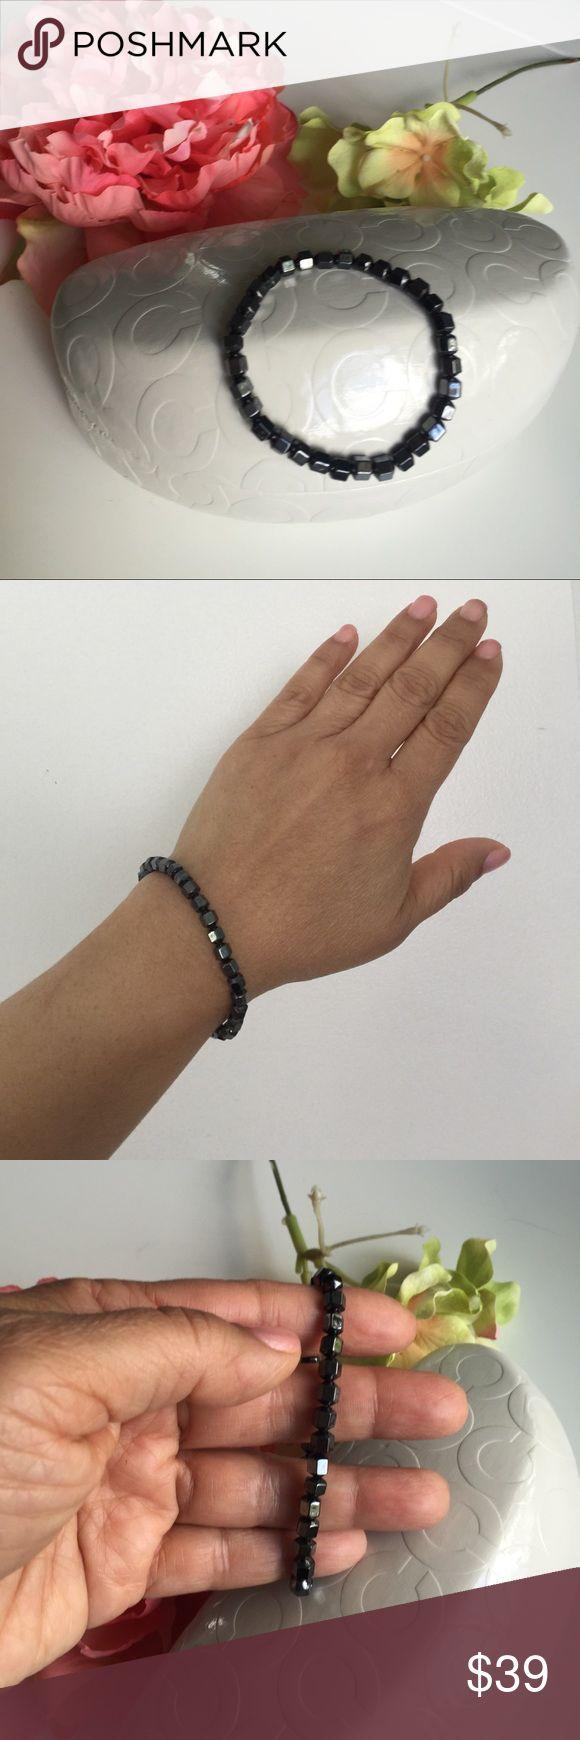 💙Onyx crystal bracelet💙NWOT 💙Onyx crystal bracelet💙beautiful bracelet is magnetized and has a stretch. Jewelry Bracelets